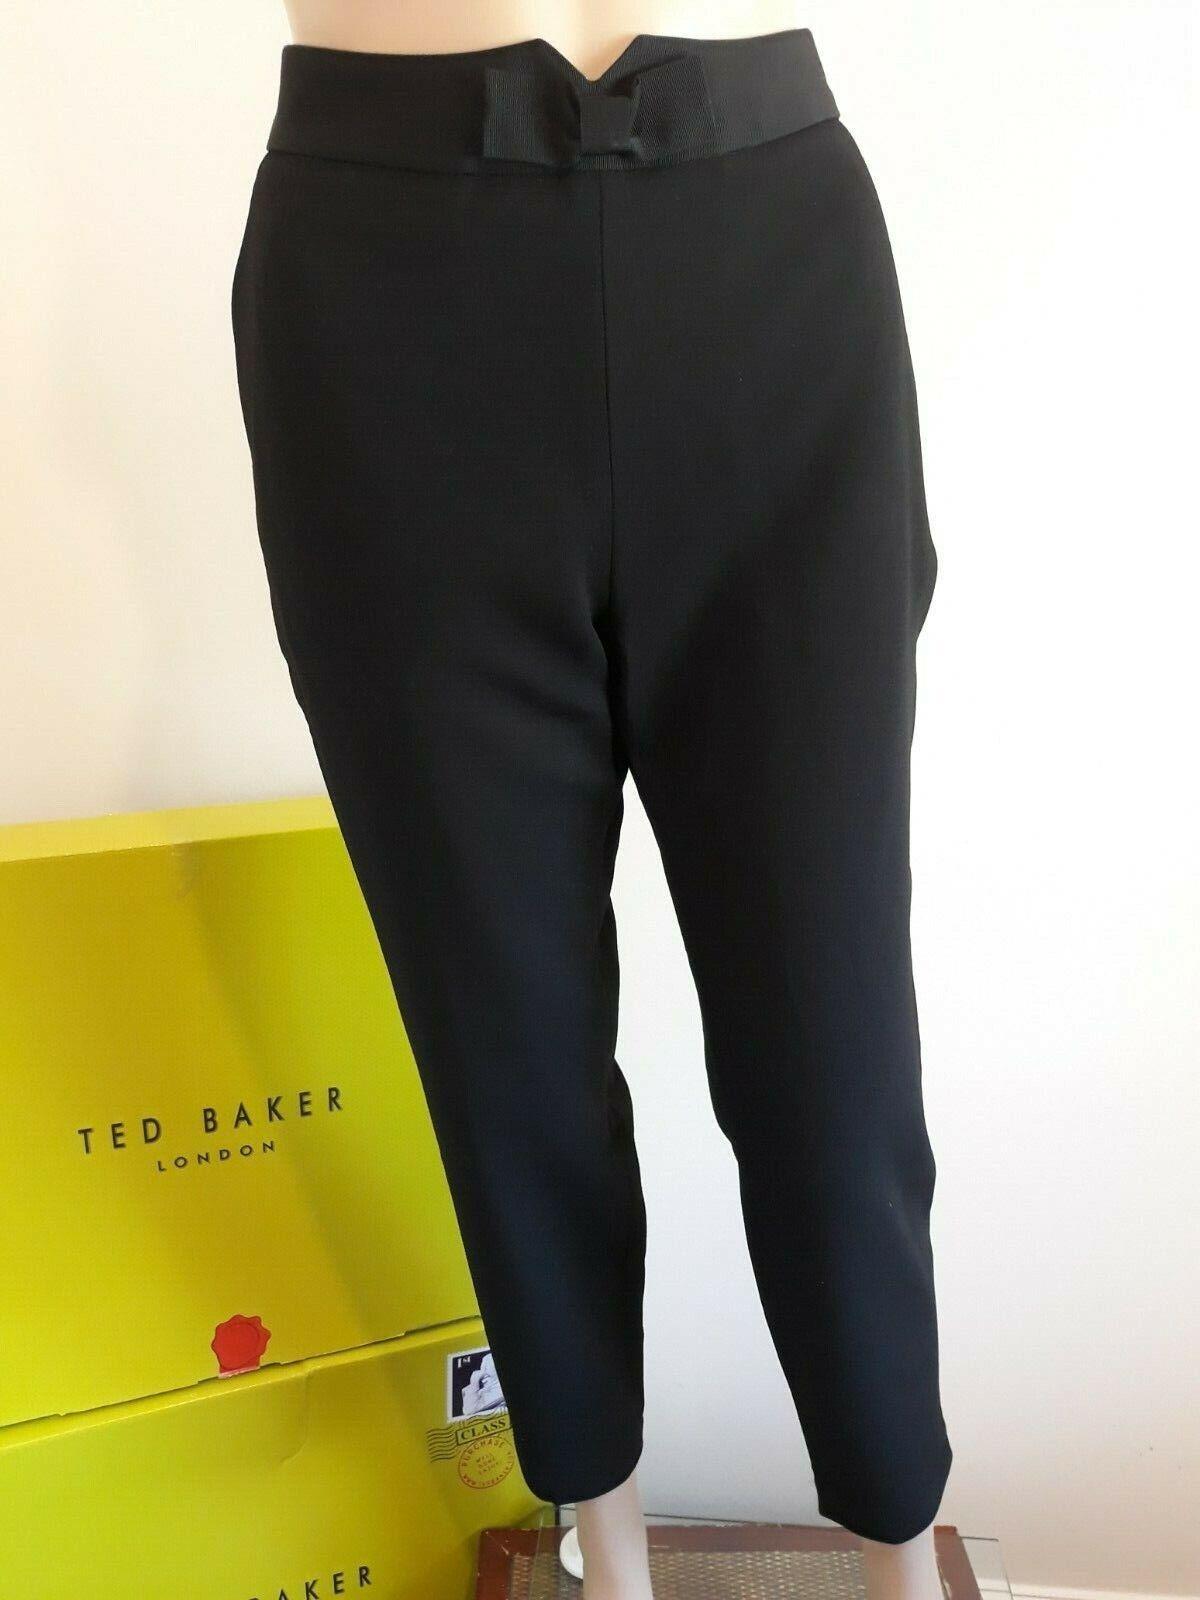 TED BAKER  zeevat  Nœud Noir Sur Mesure Pantalon Bnwt UK 12 Ted 3 USA 8